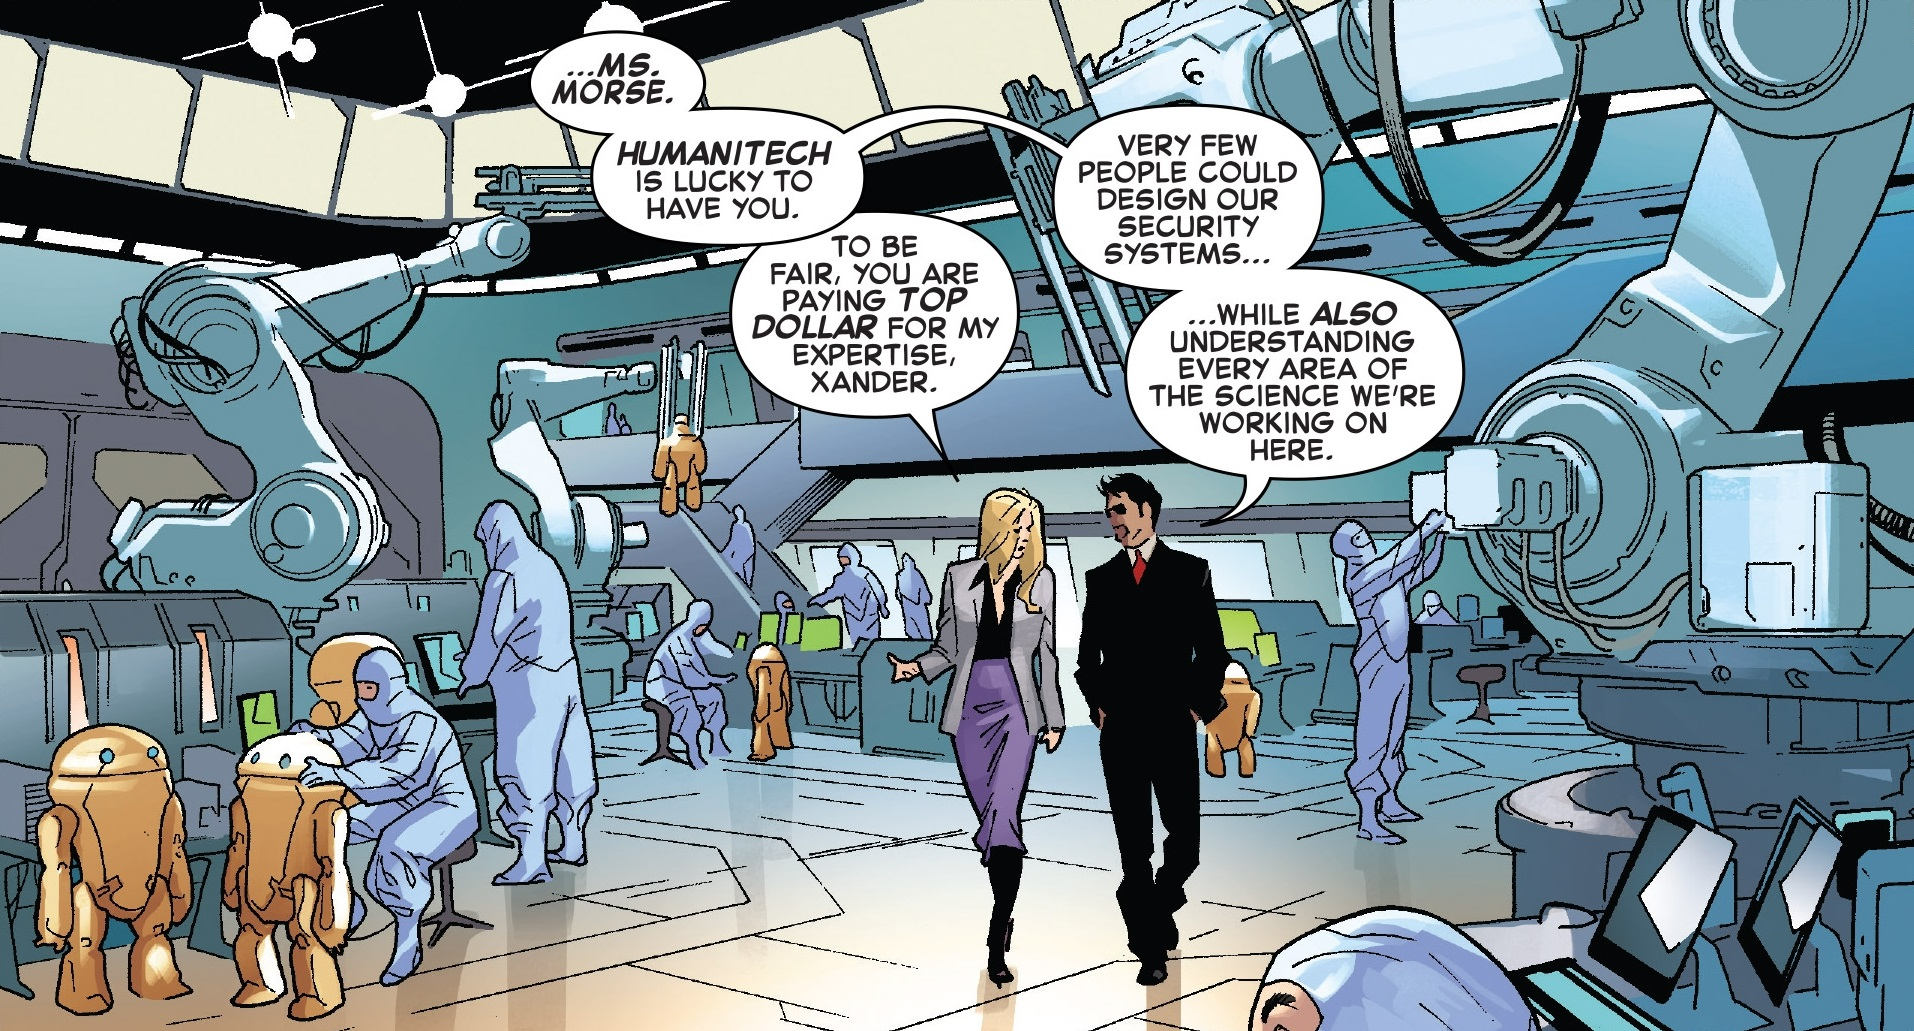 Humanitech Robotics Inc. (Earth-616) from Amazing Spider-Man Vol 1 791 001.jpg